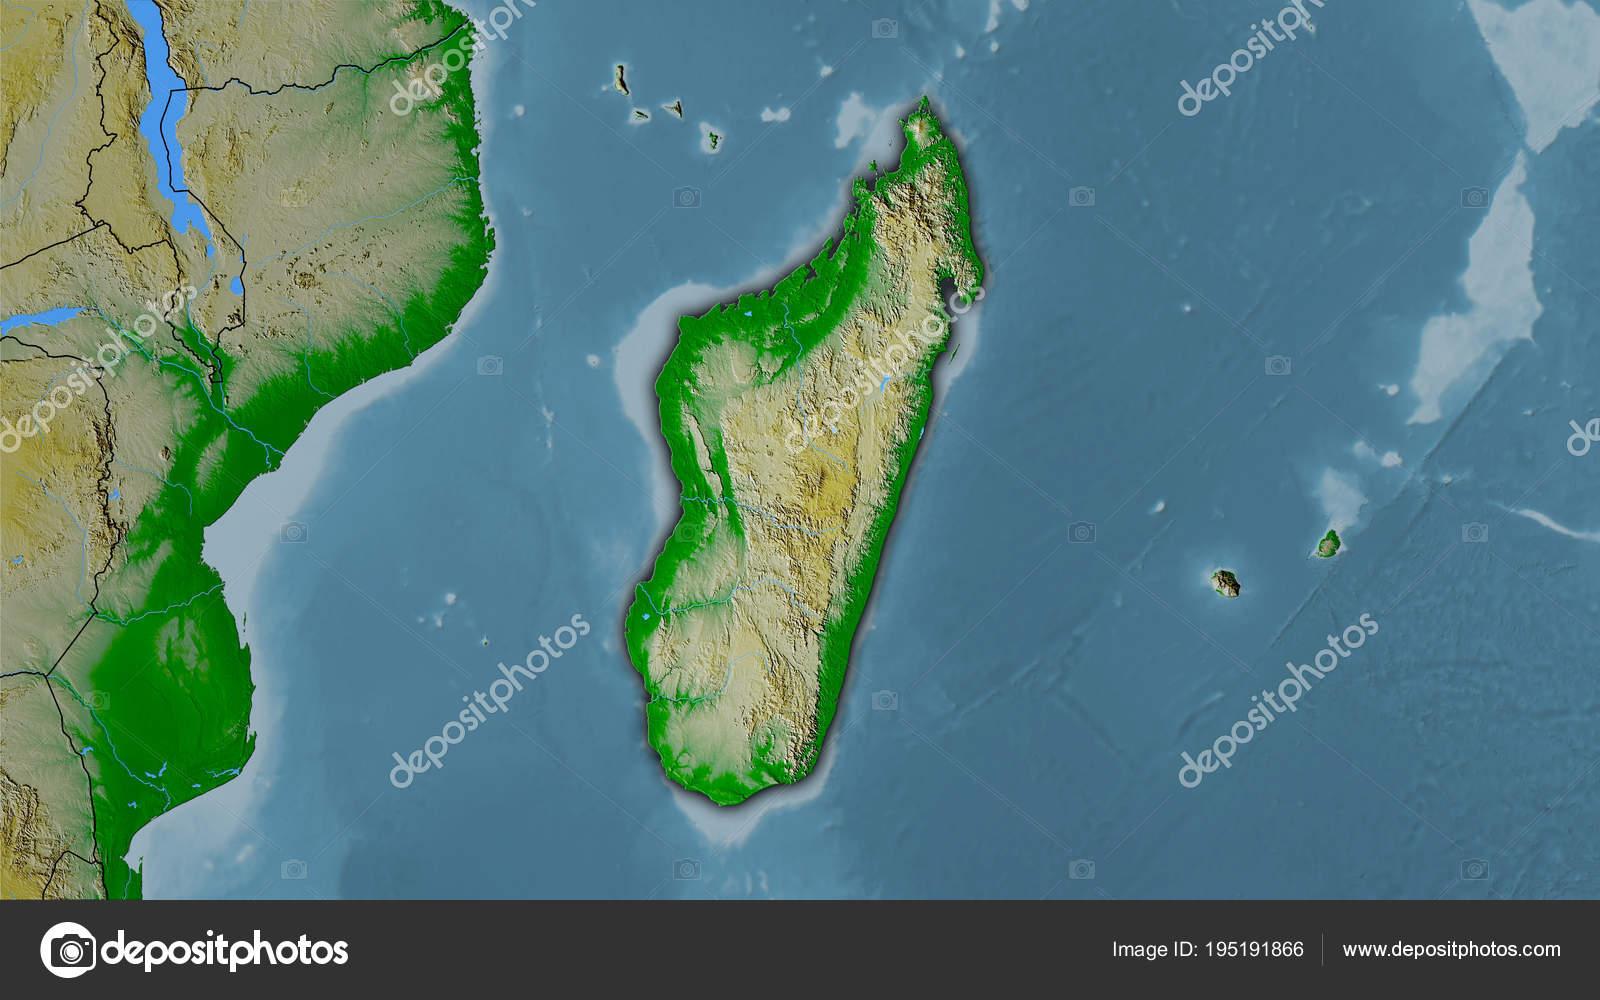 Topographic Map Of Madagascar.Madagascar Topographic Physical Dark Glow Stock Photo C Yarr65